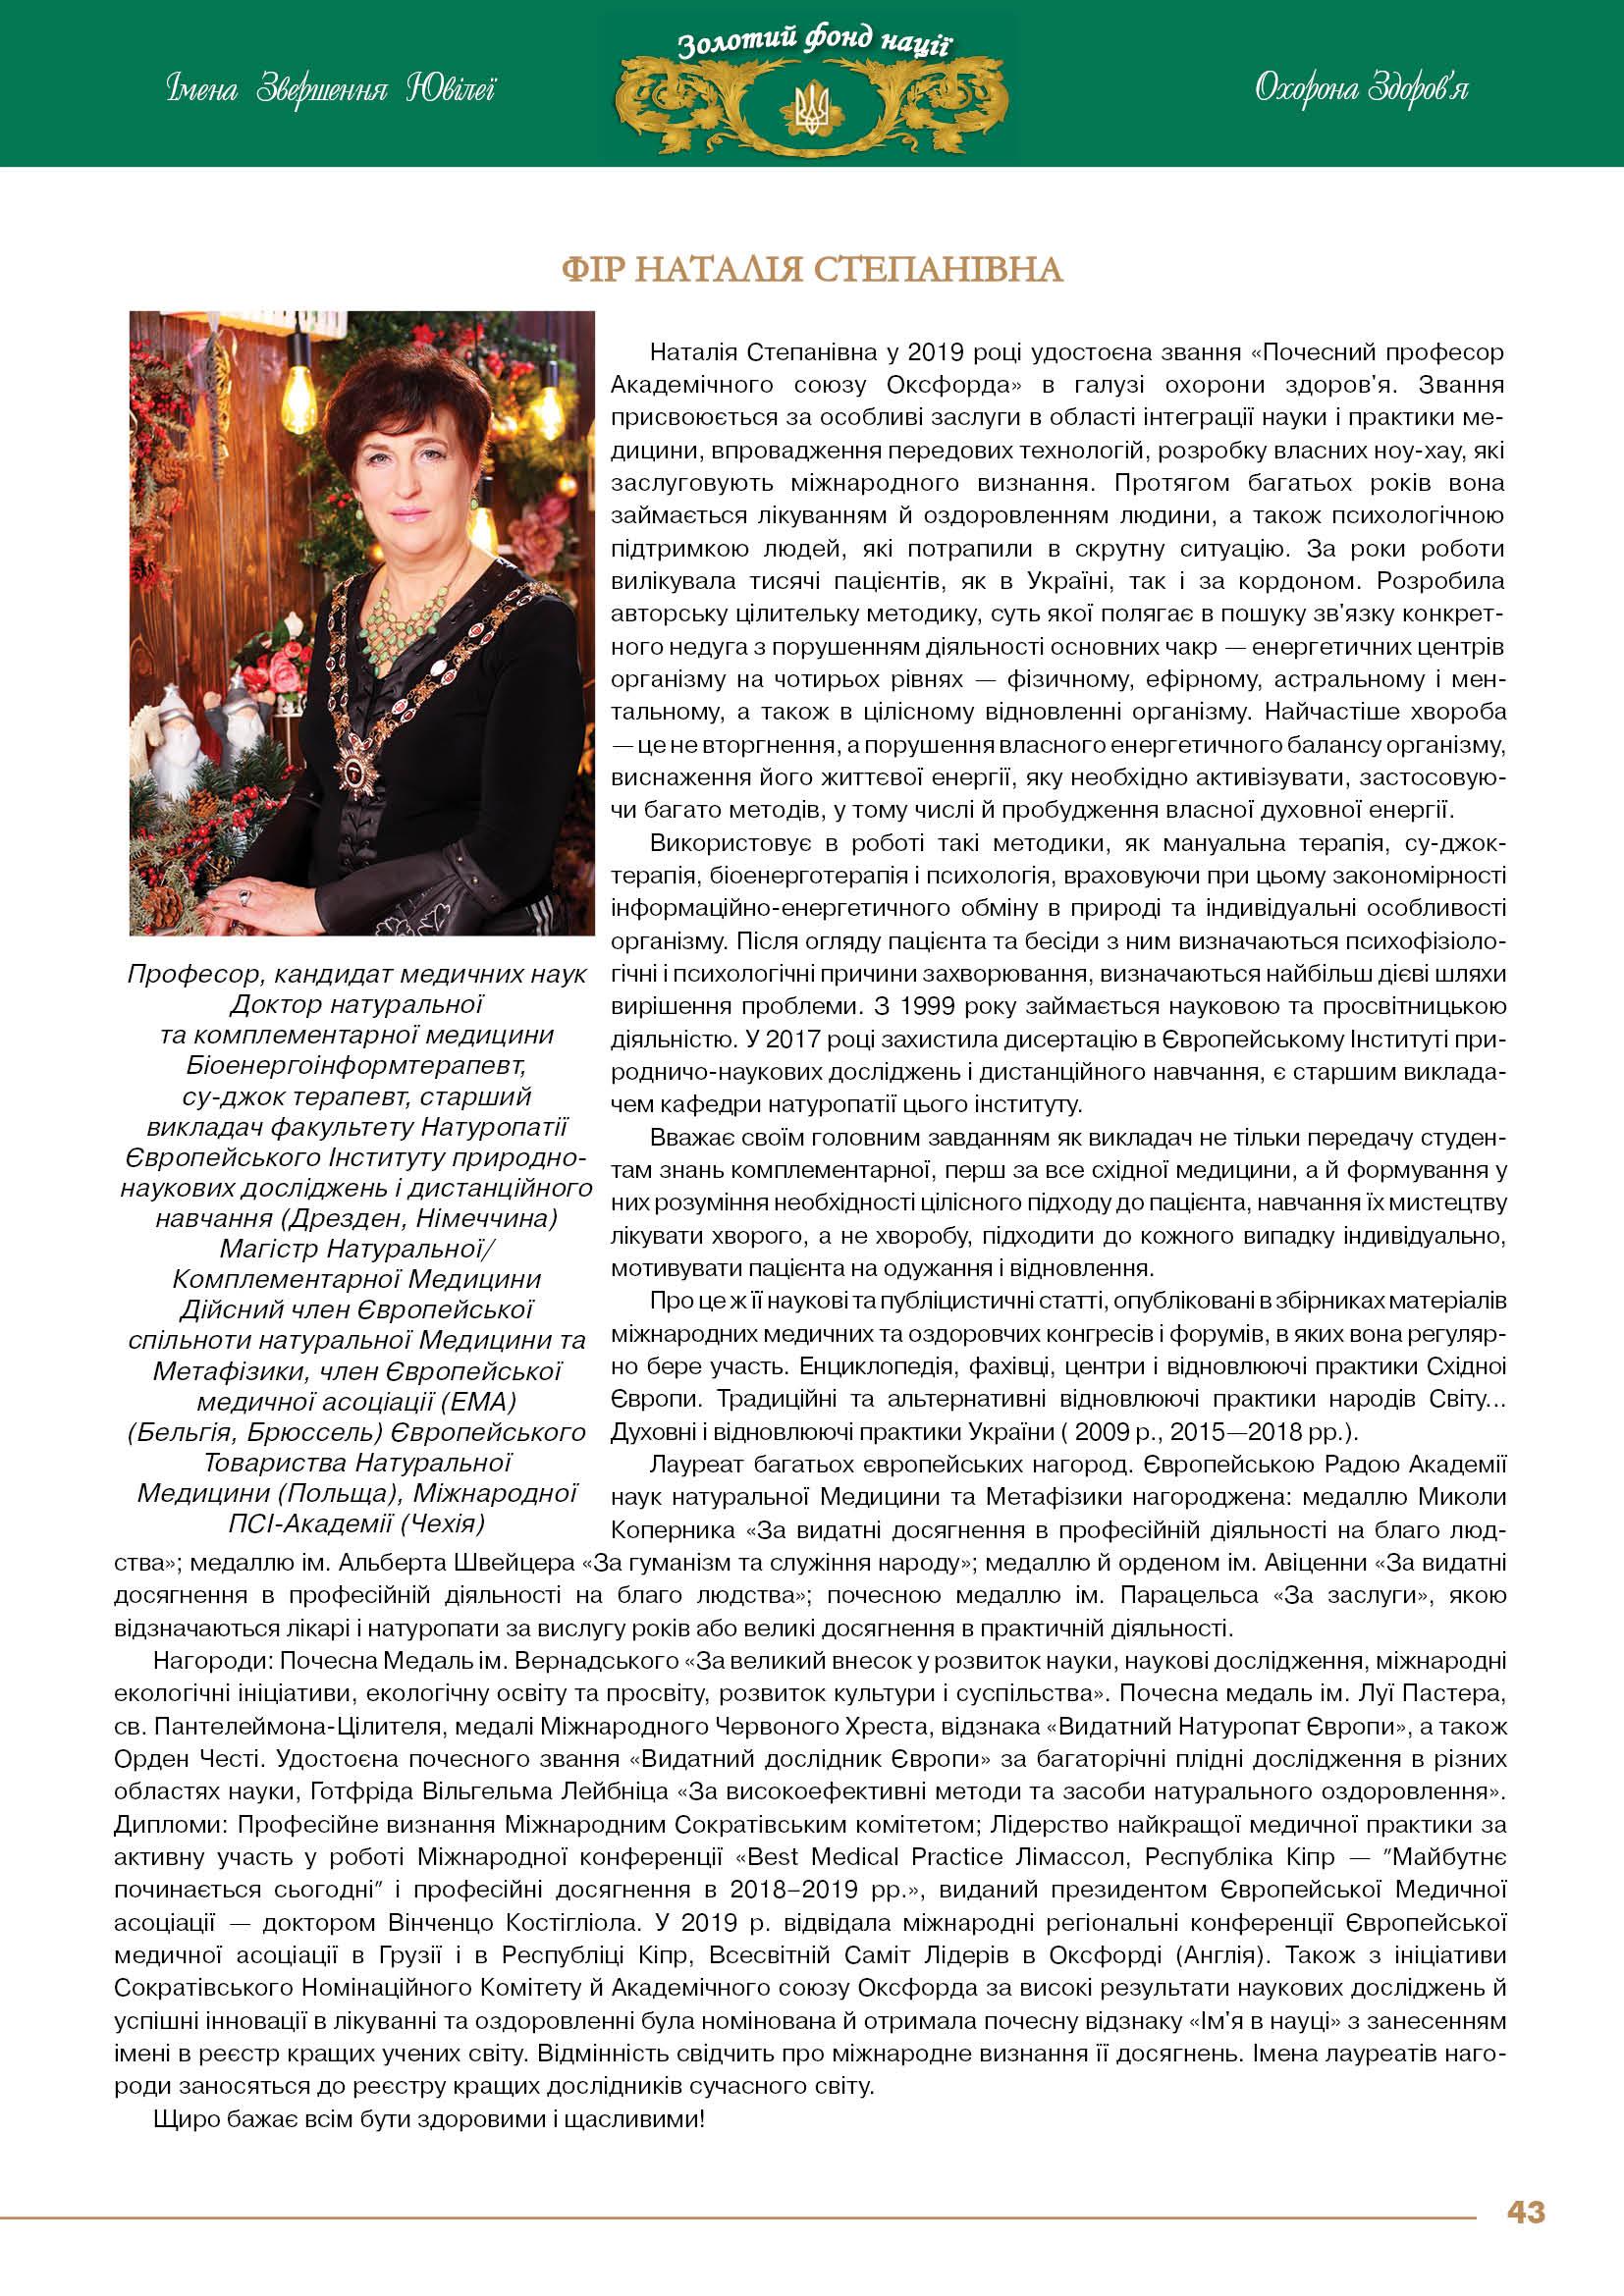 Фір Наталія Степанівна